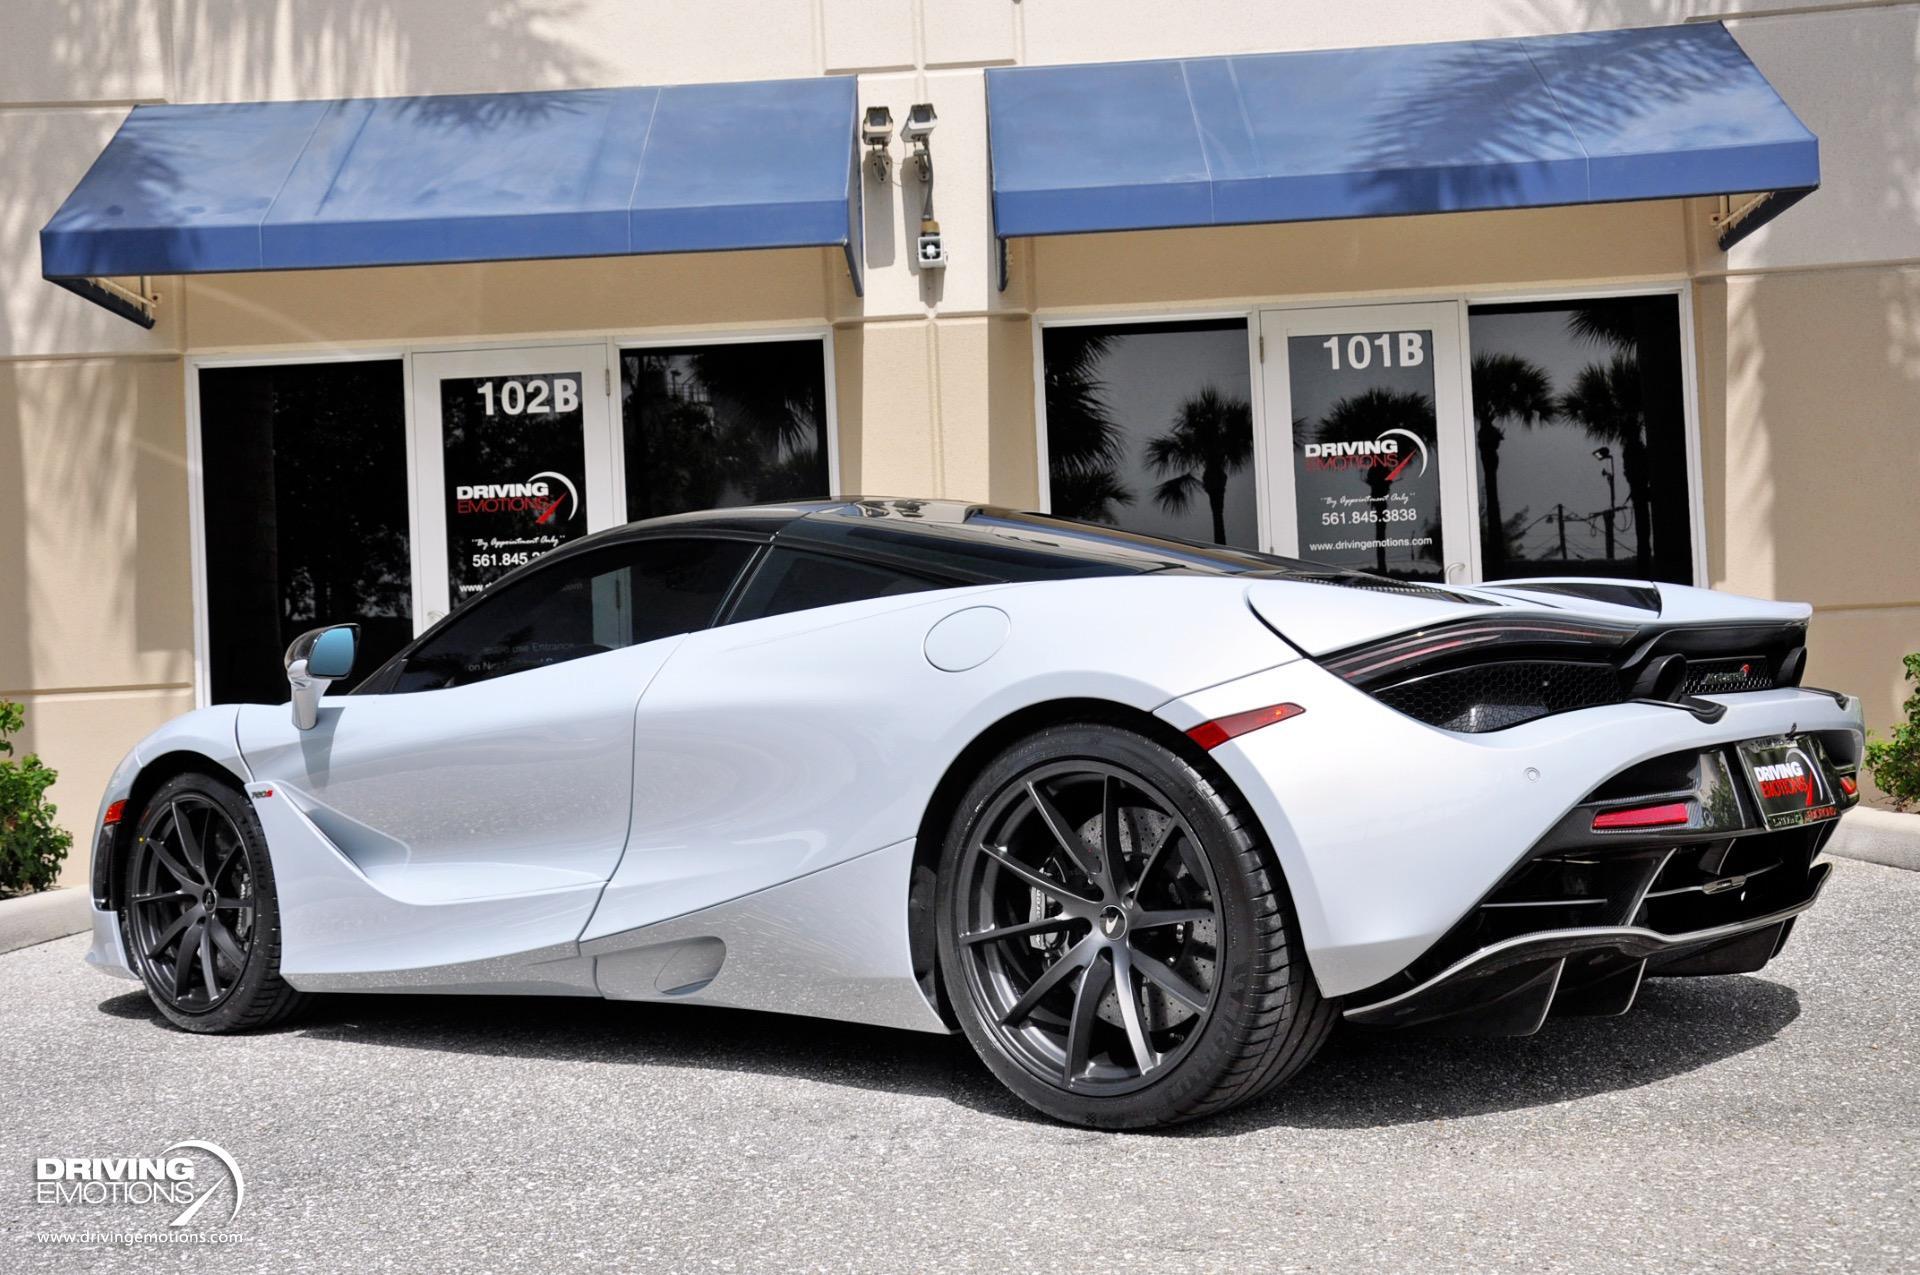 Used 2018 McLaren 720S Luxury $393k MSRP!! | Lake Park, FL